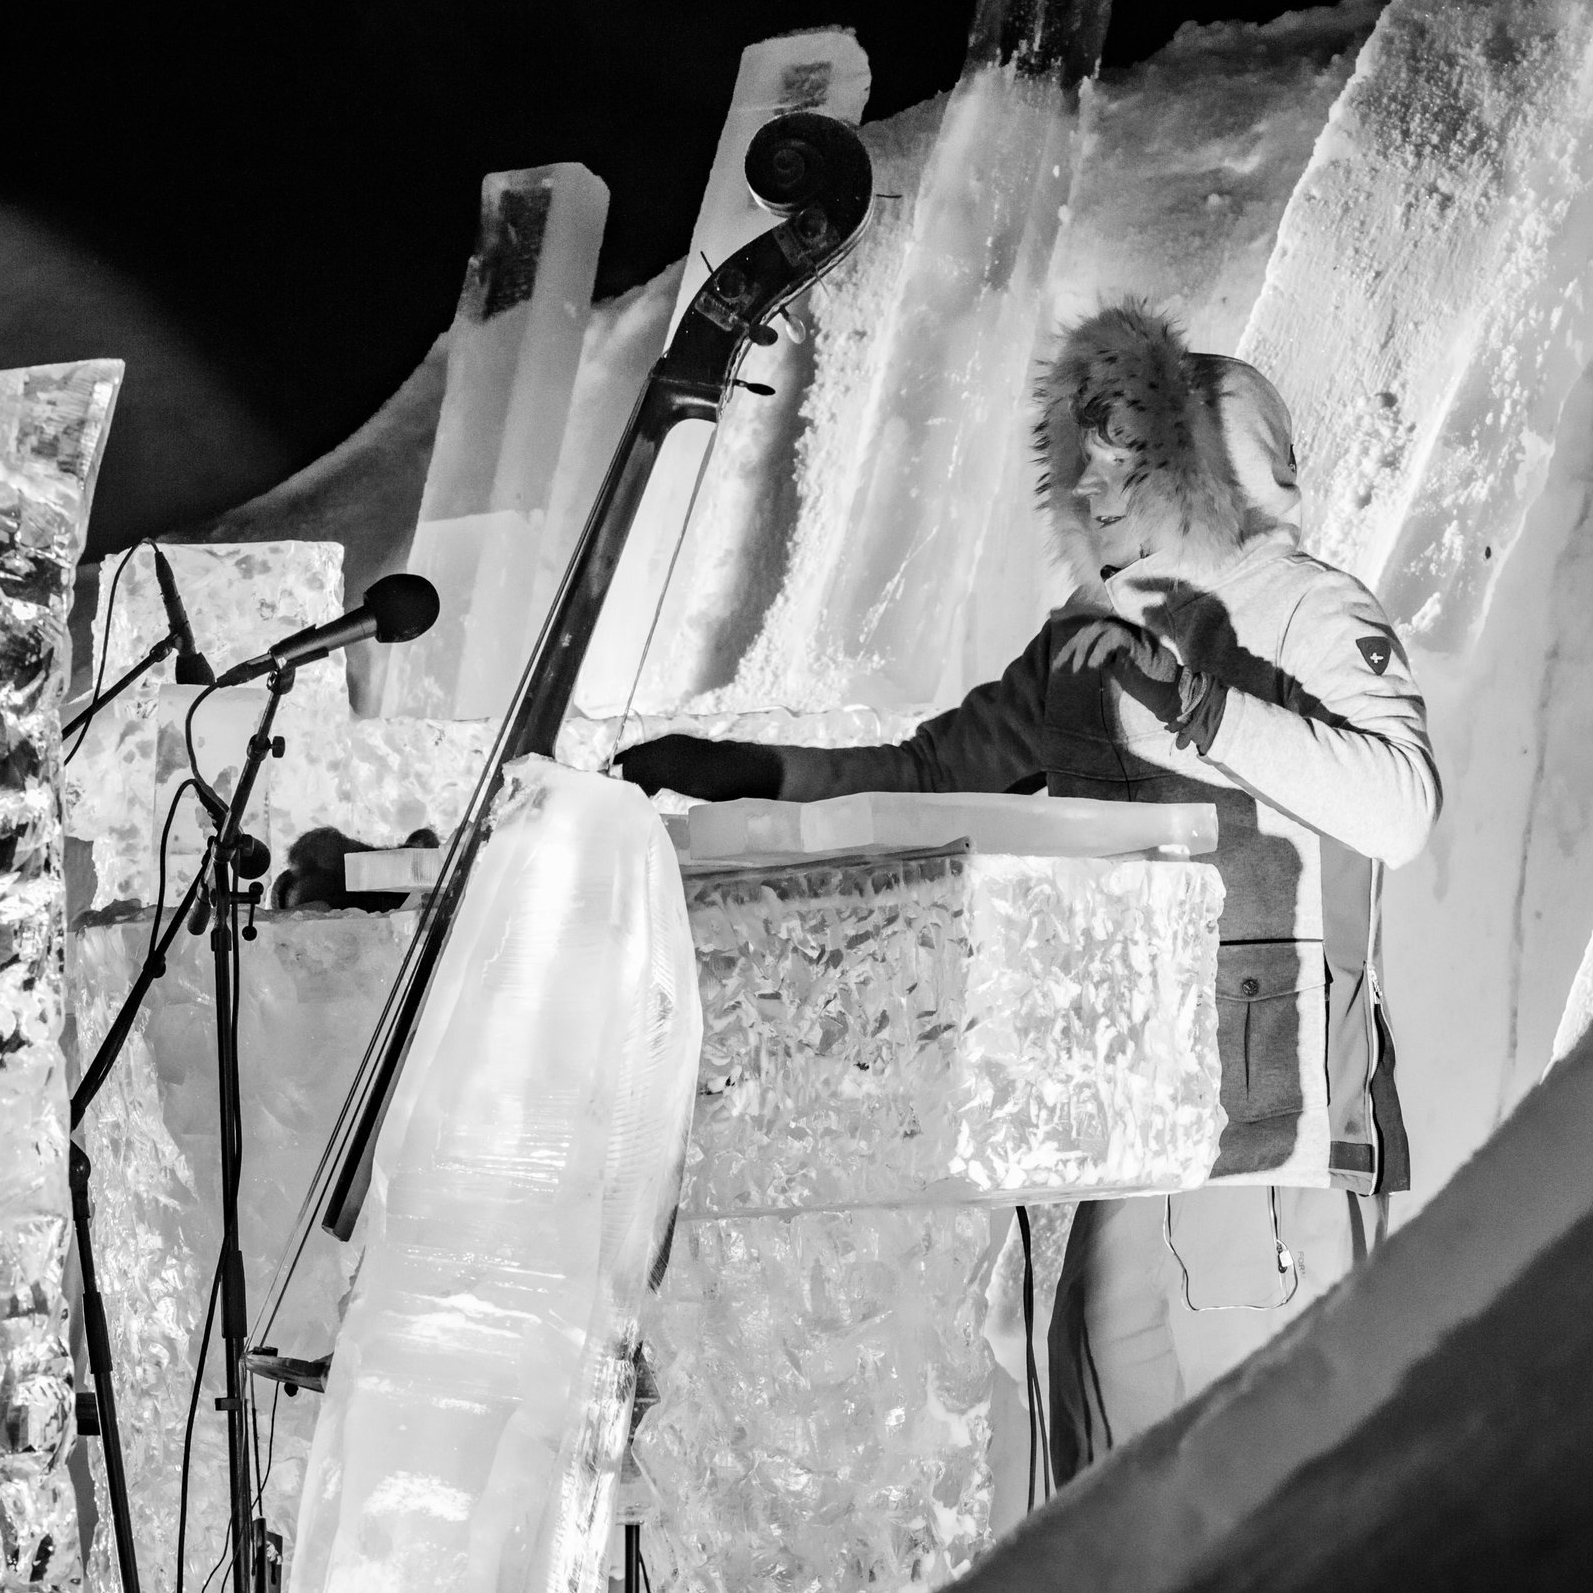 Ice-music-festival-FotoKnoff-sven-erik-knoff-2655.jpg